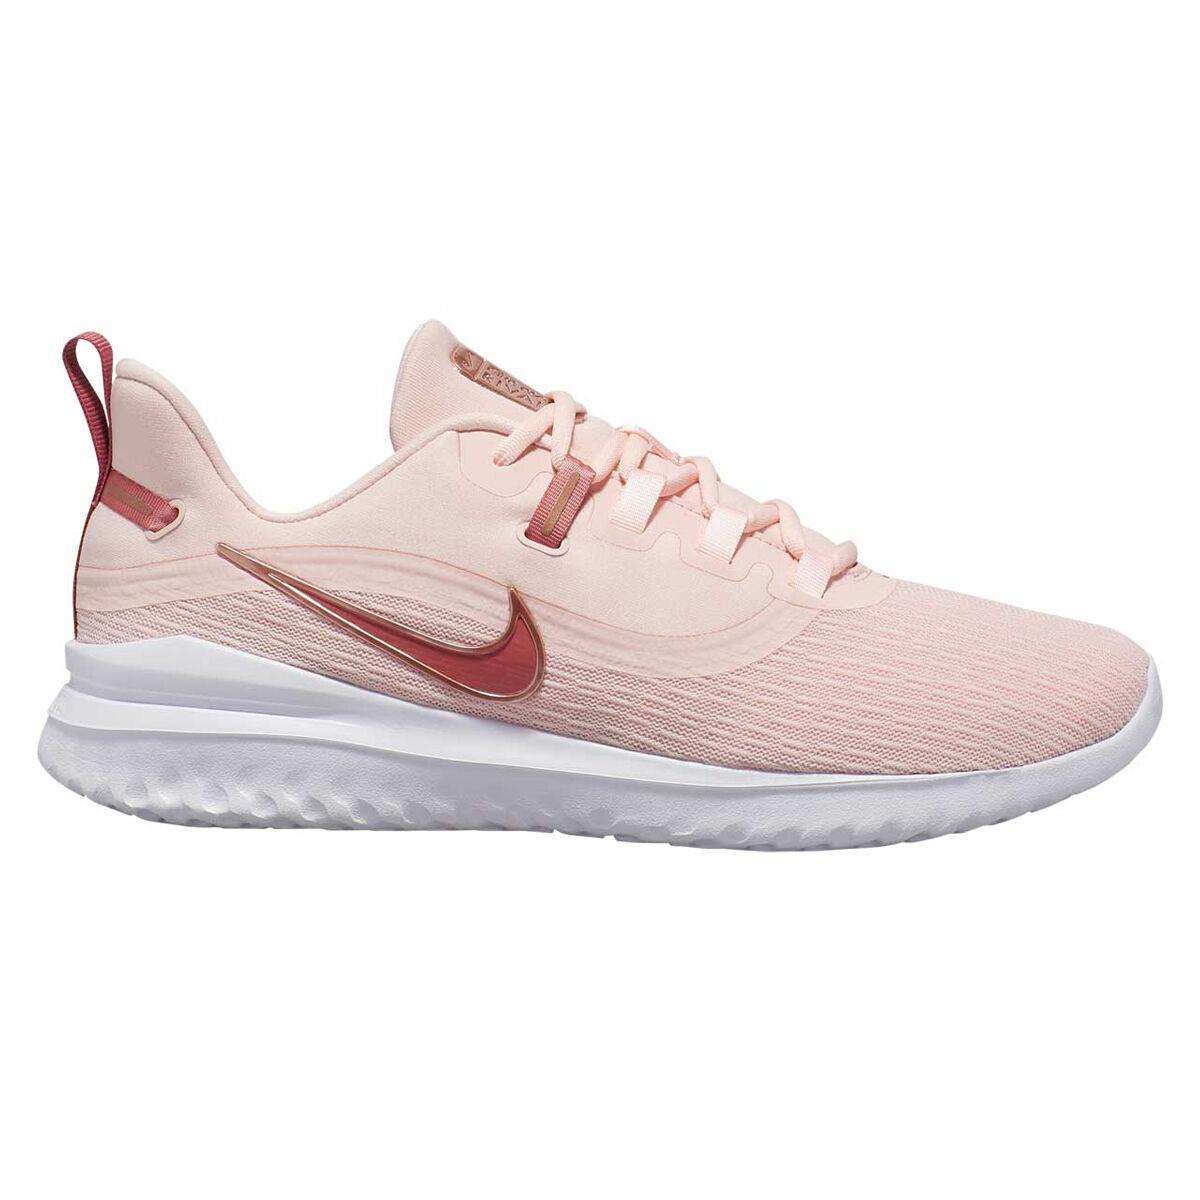 Nike Renew Rival 2 Womens Running Shoes